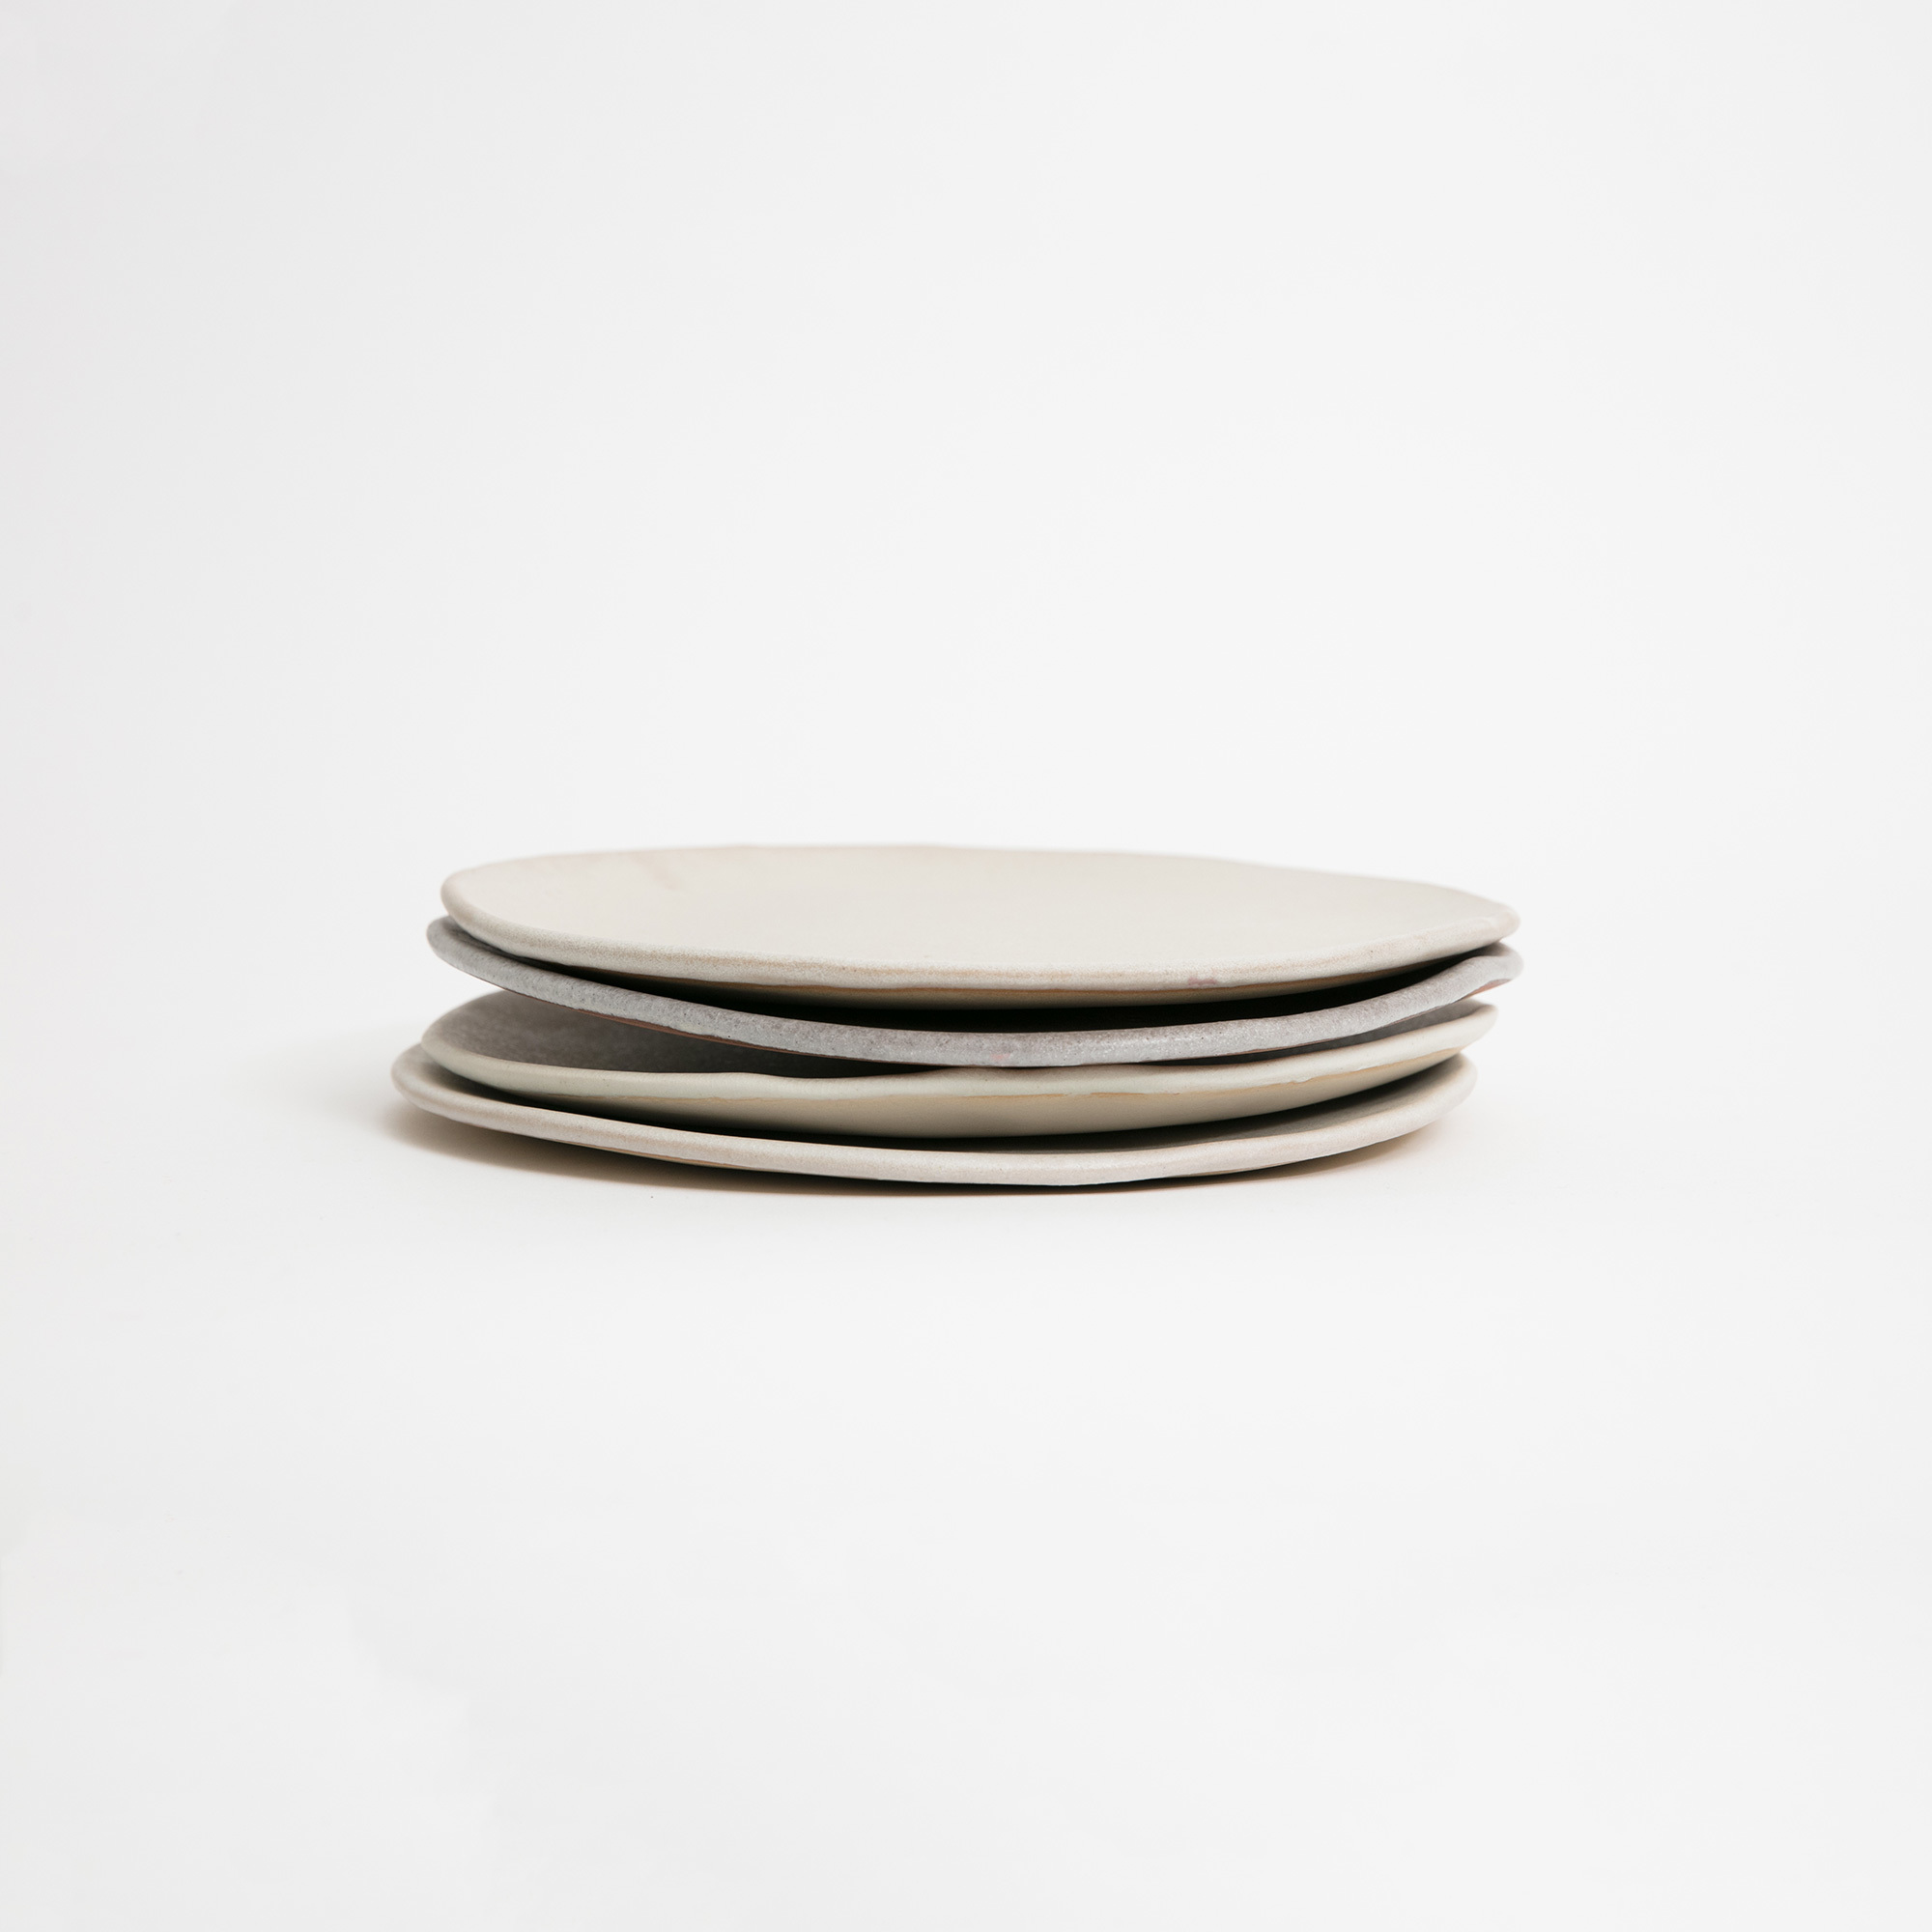 Set of 4 Ecru Hand-Thrown Ceramic Plates & Marion Graux Handmade Off White Ceramic Plates | The Garnered